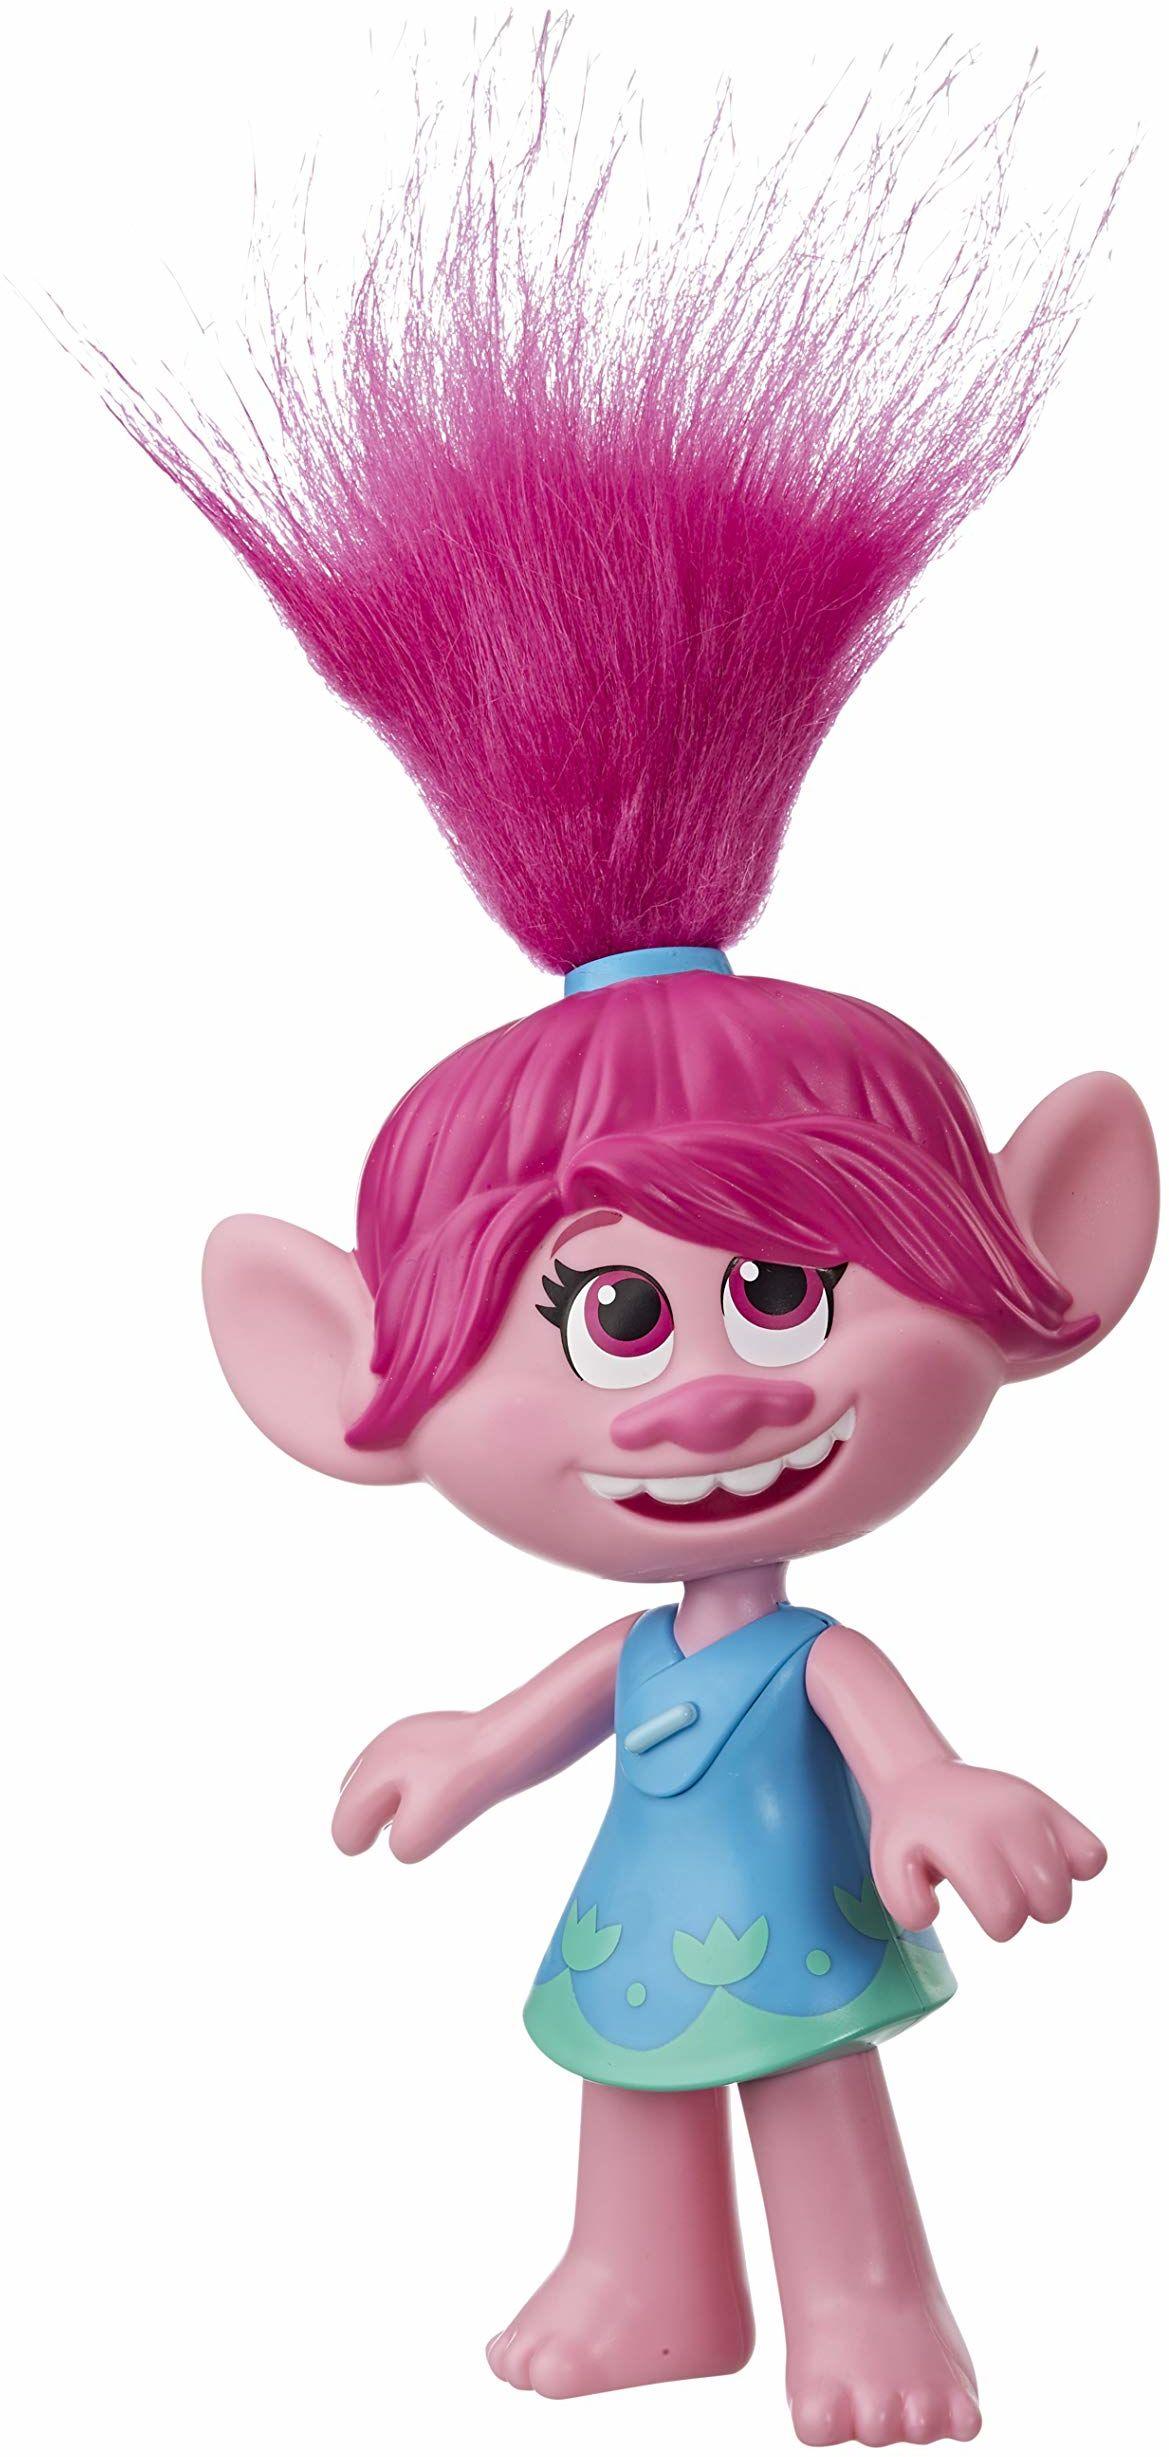 DreamWorks Trolls World Tour Superstar lalka makowa, śpiewa Trolls Just Want to Have Fun, lalka śpiewająca, zabawka dla dzieci 4 i więcej